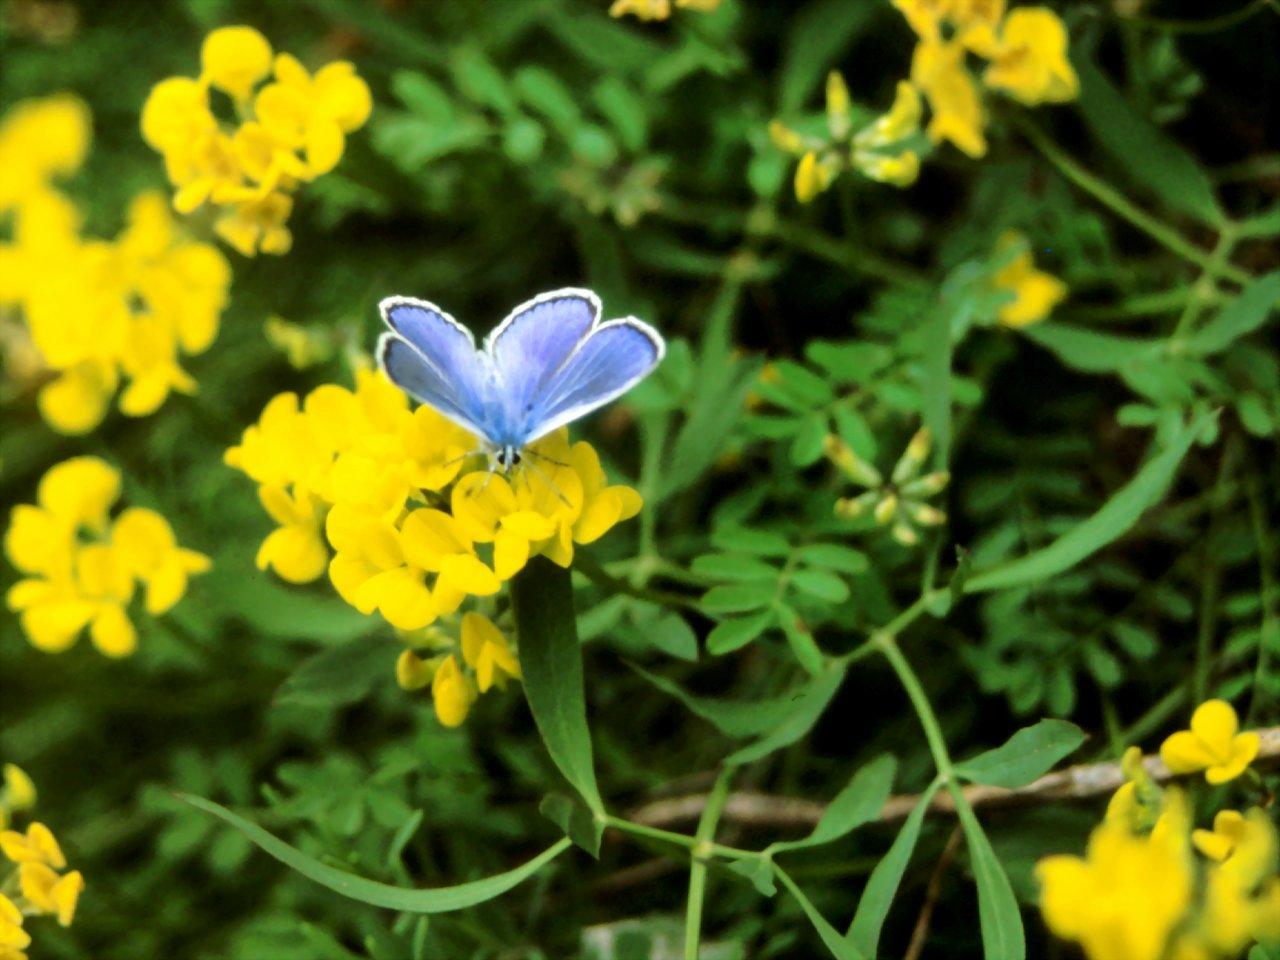 fiori gialli rari